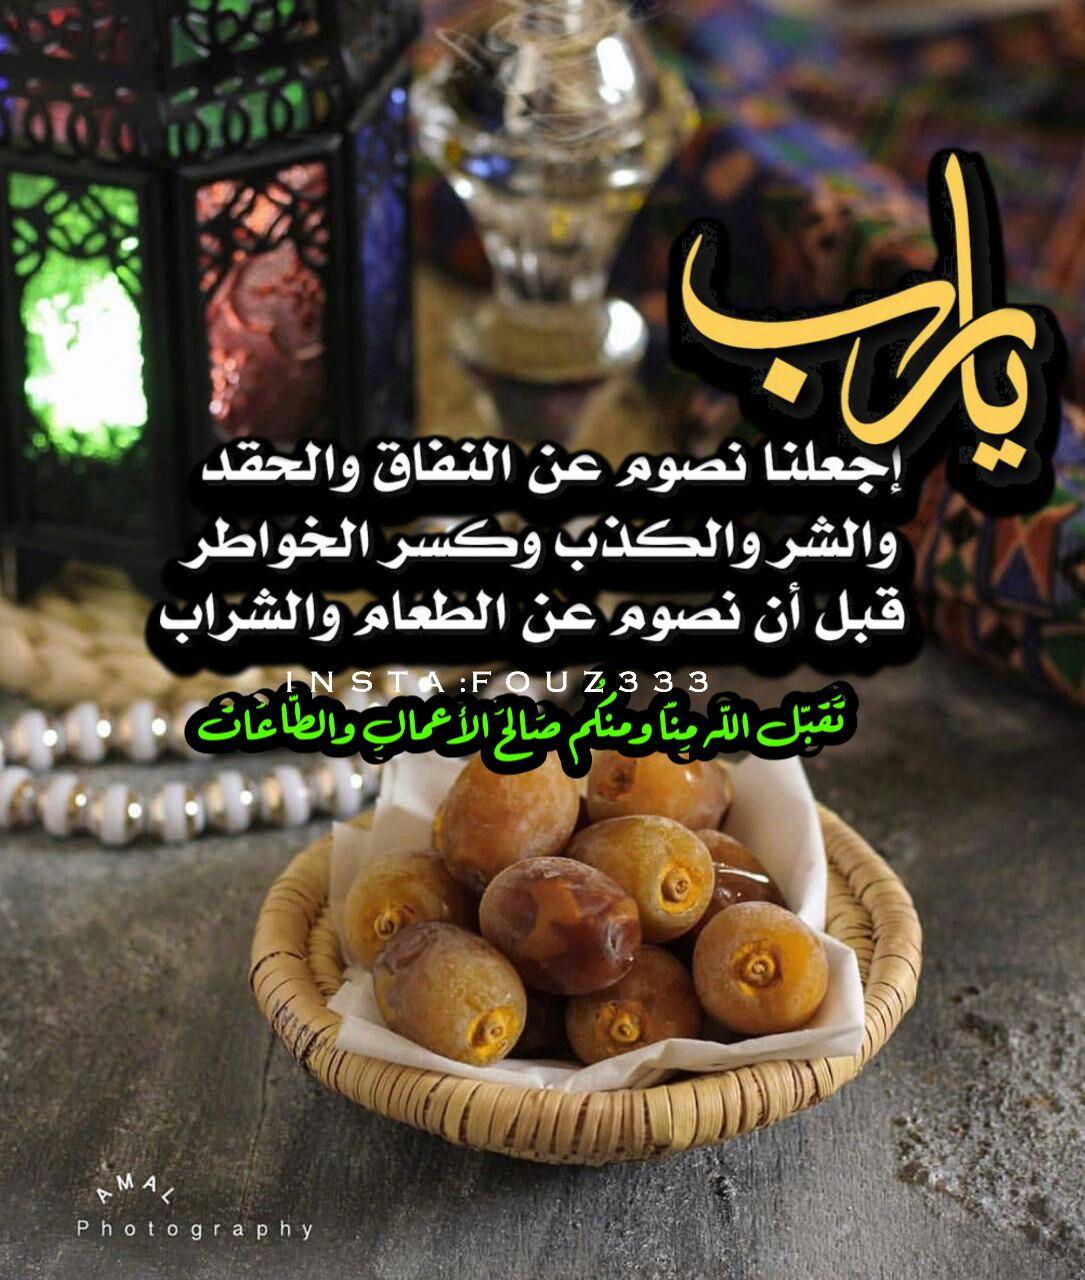 Pin By Nane On رمضان Ramadan Ramadan Decorations Ramadan Kareem